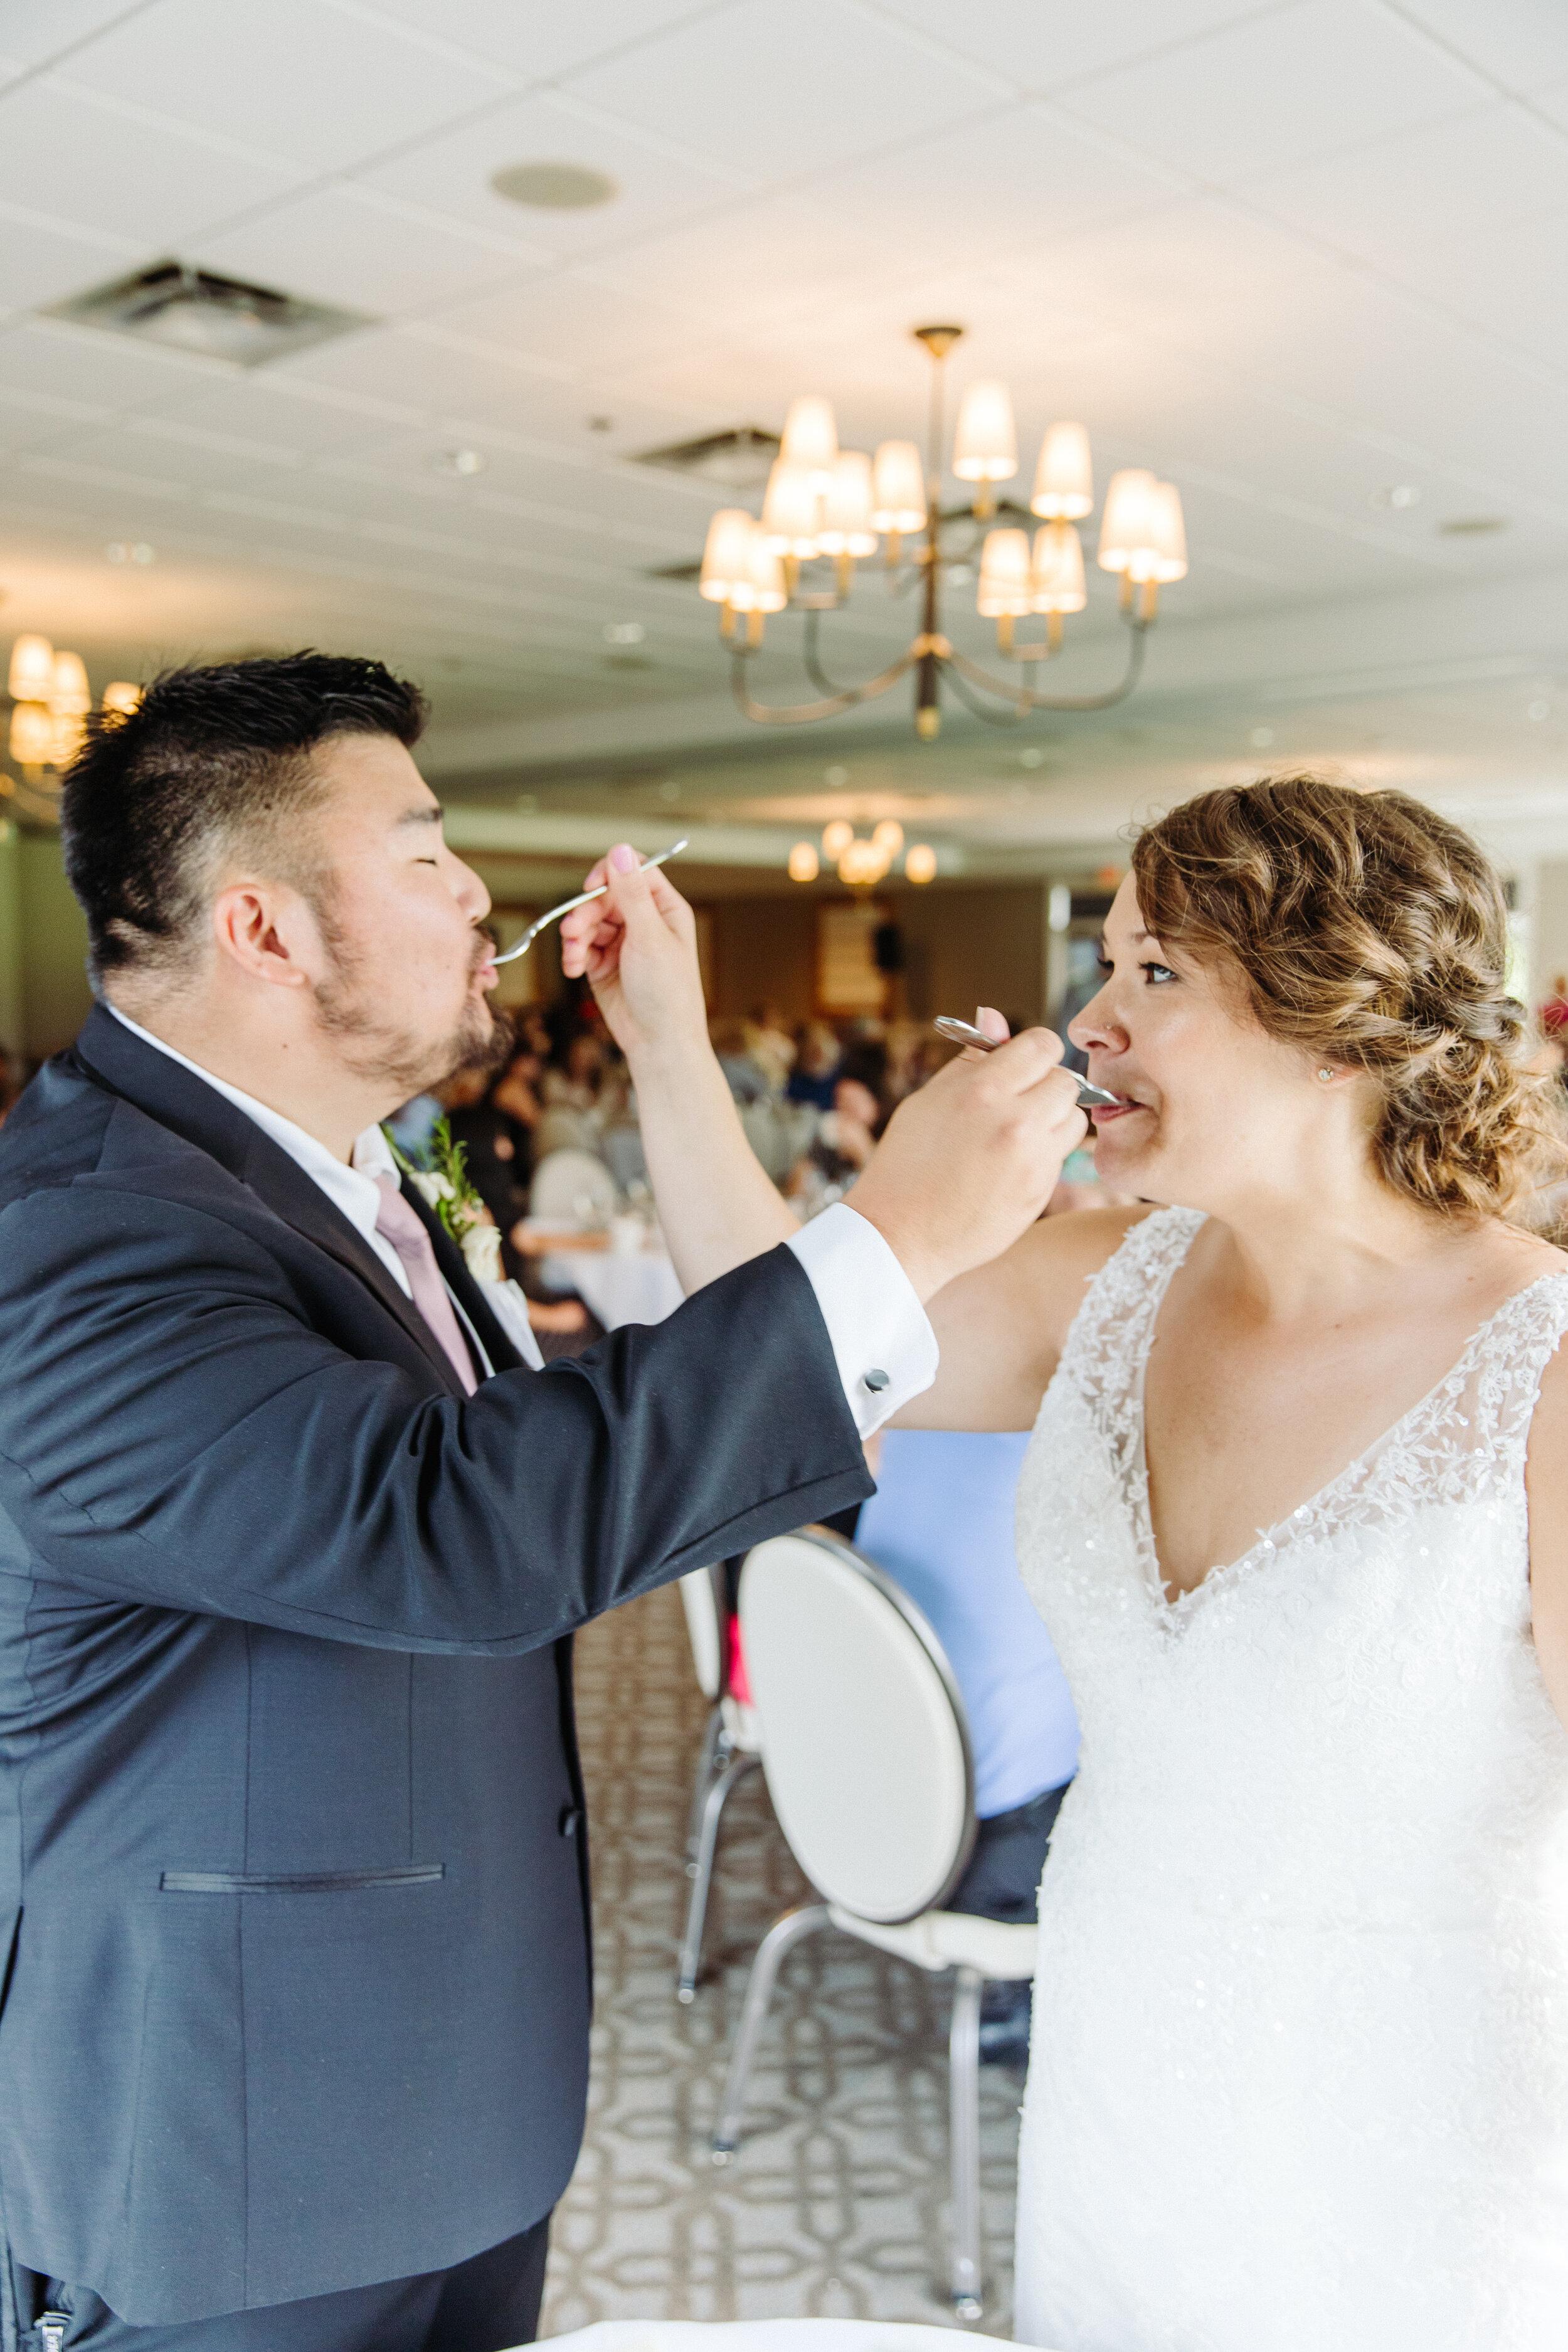 S&B Wedding- Reception & Dance-37.jpg